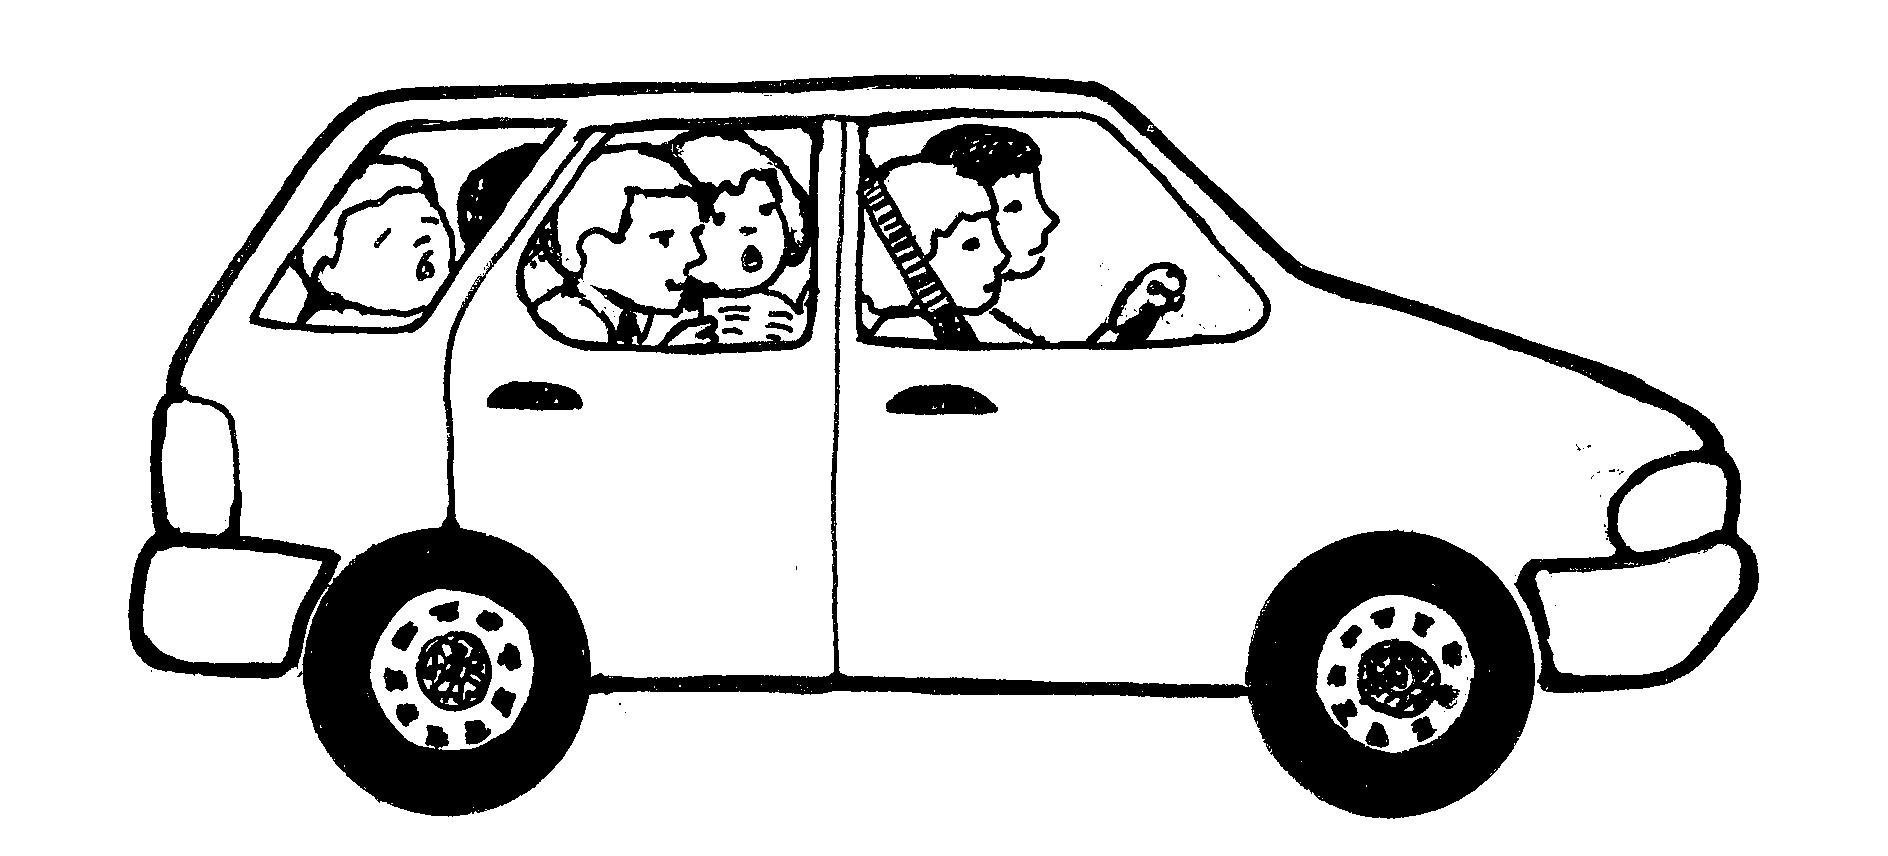 Clip Art Car Images Clip Art people in car clipart kid image clip art best